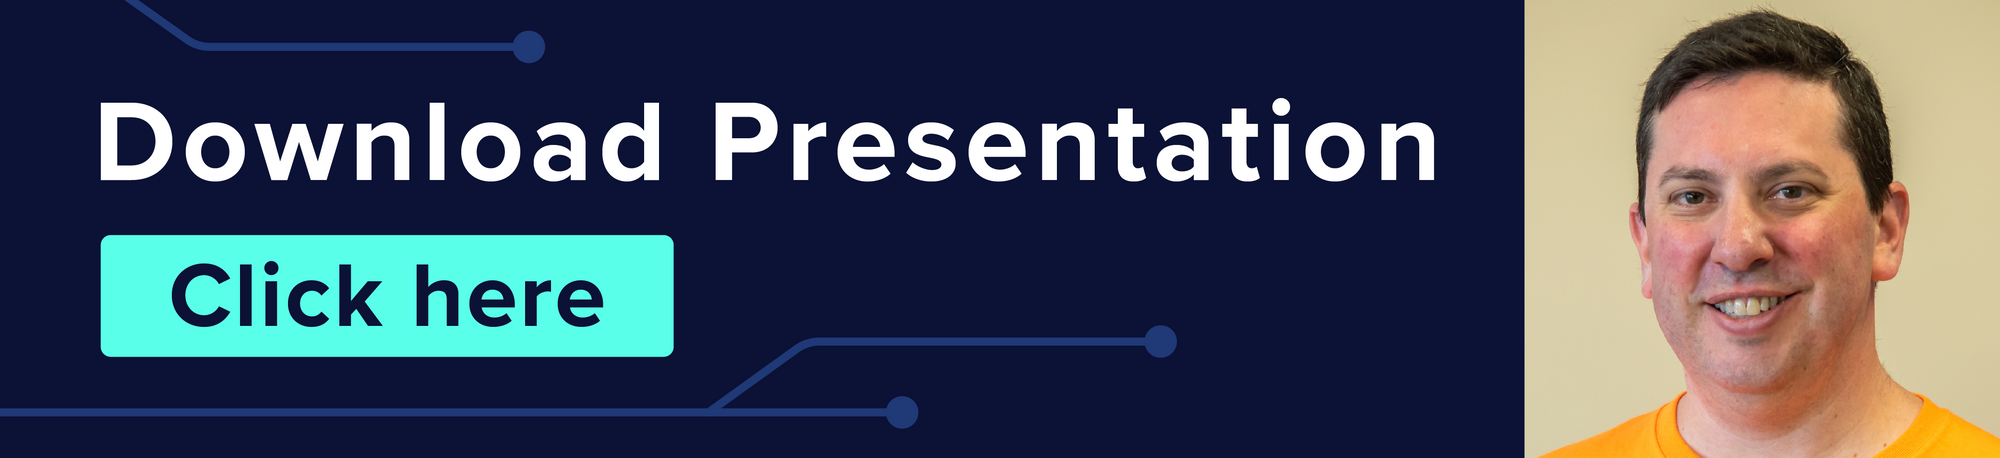 Jeremy-Edburg_Presentation-banner-04-2